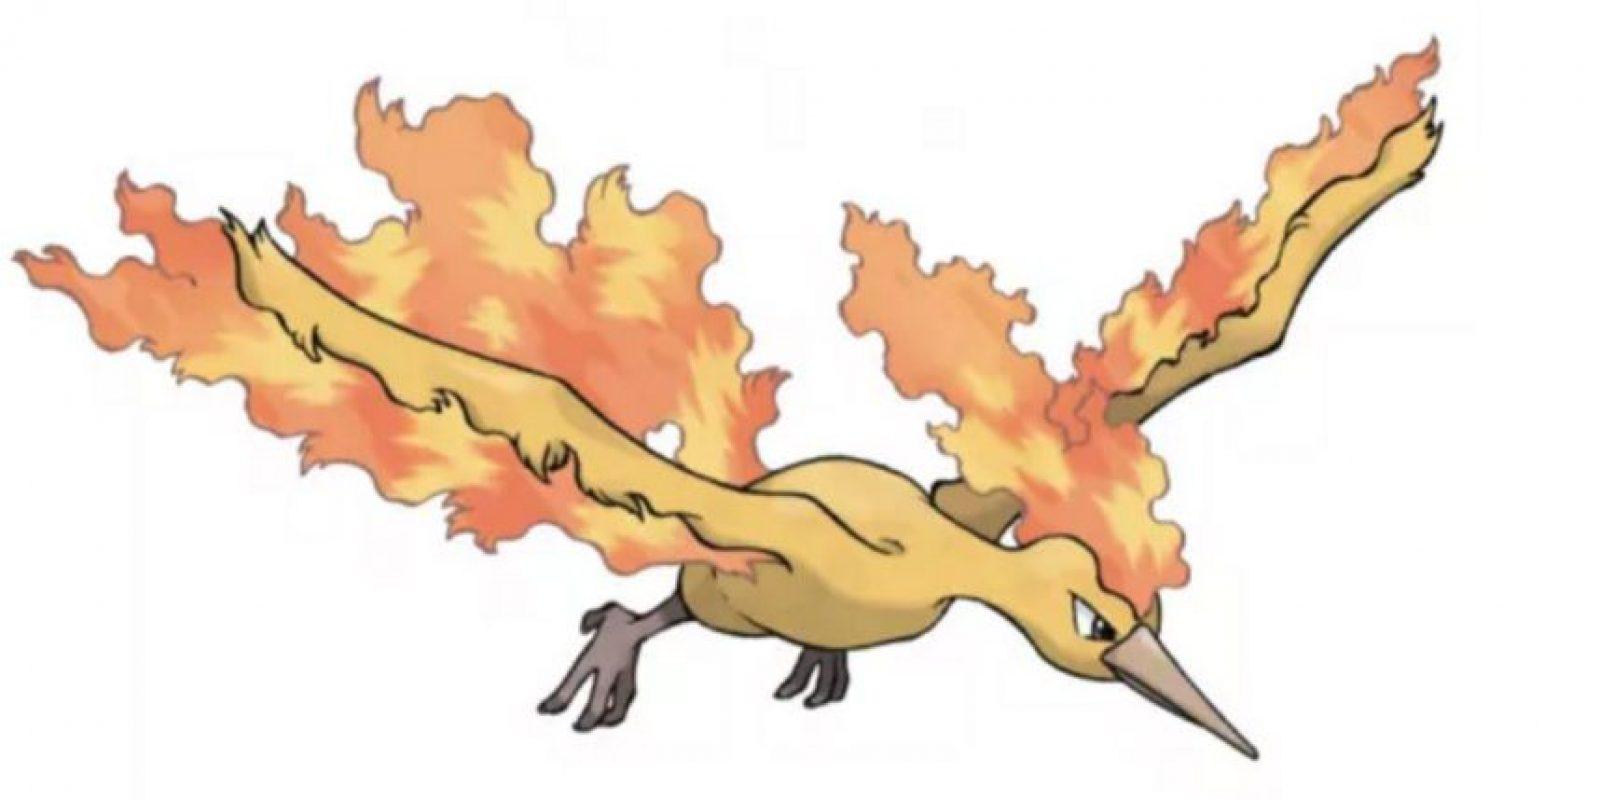 3.- Moltres, emblema del equipo rojo y ave legendaria. Foto:Pokémon